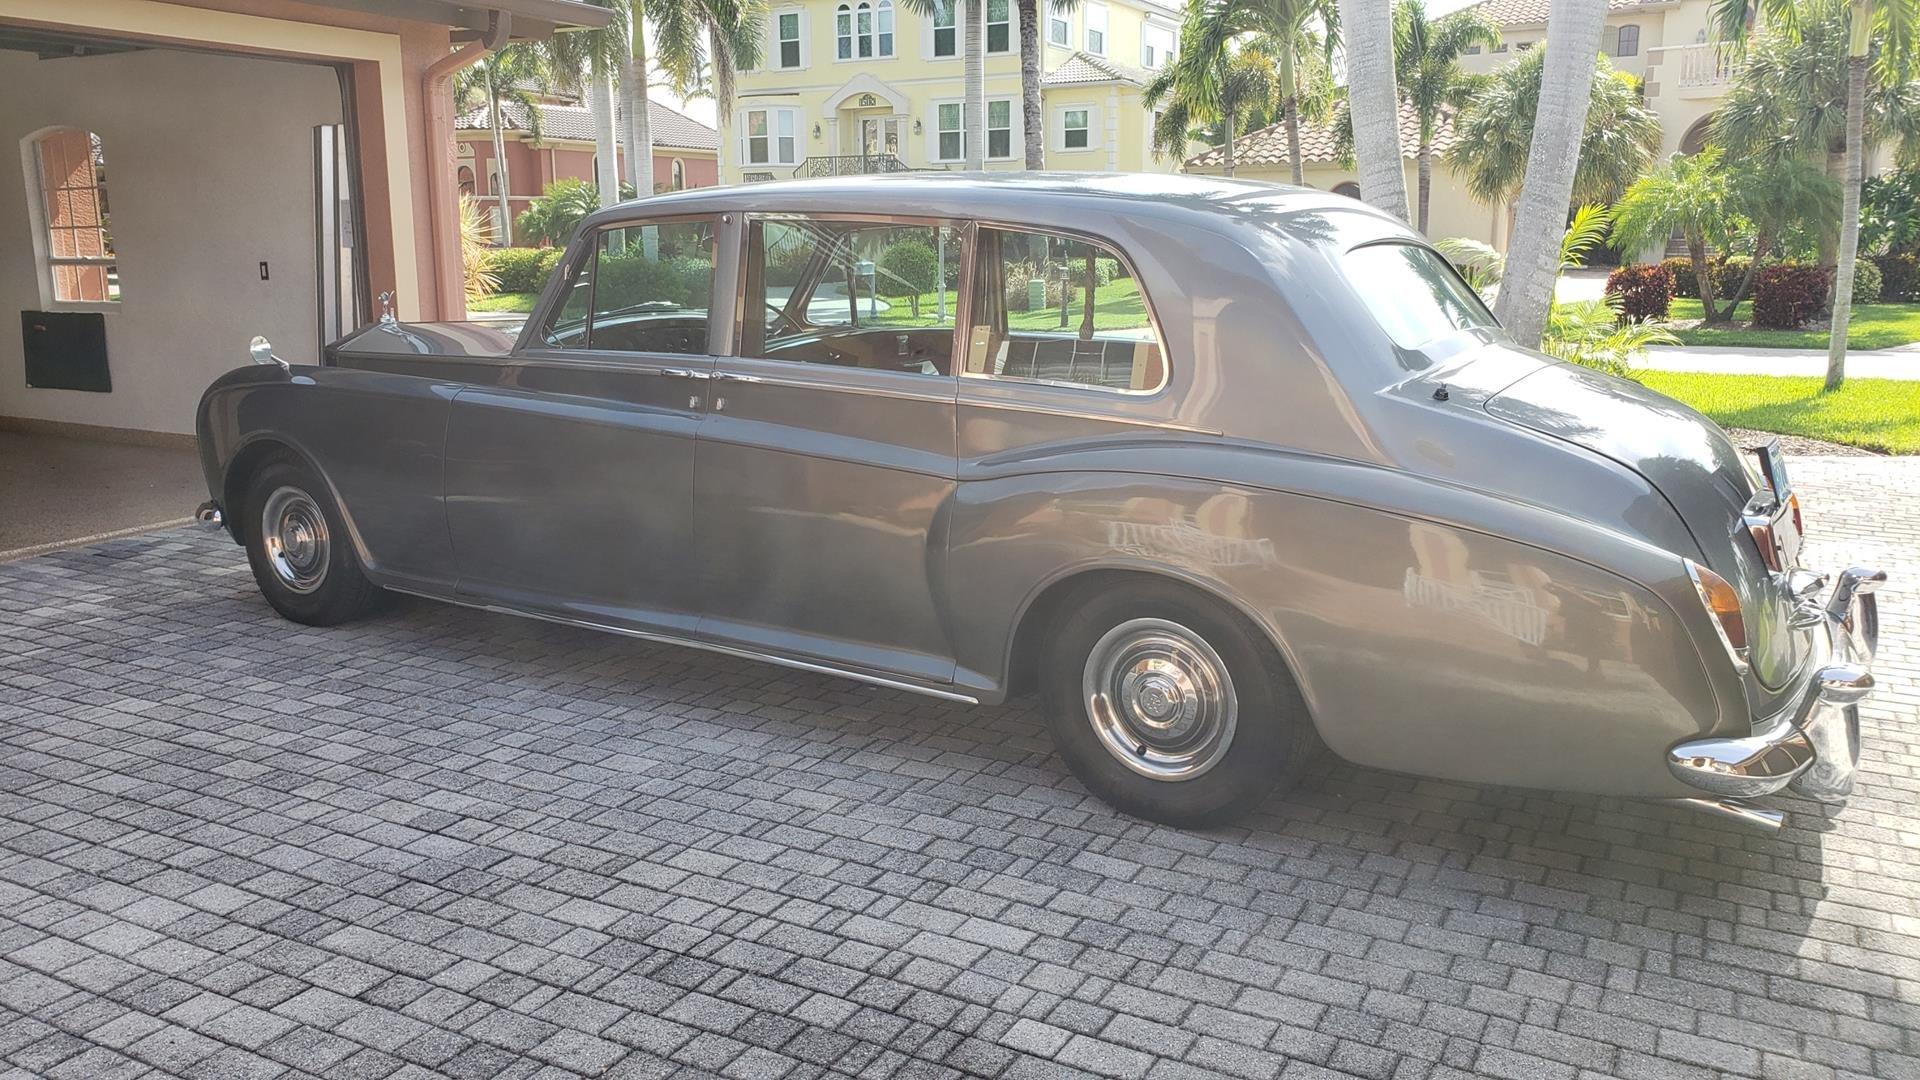 1963 Rolls Royce Phantom V RHD For Sale (picture 4 of 6)